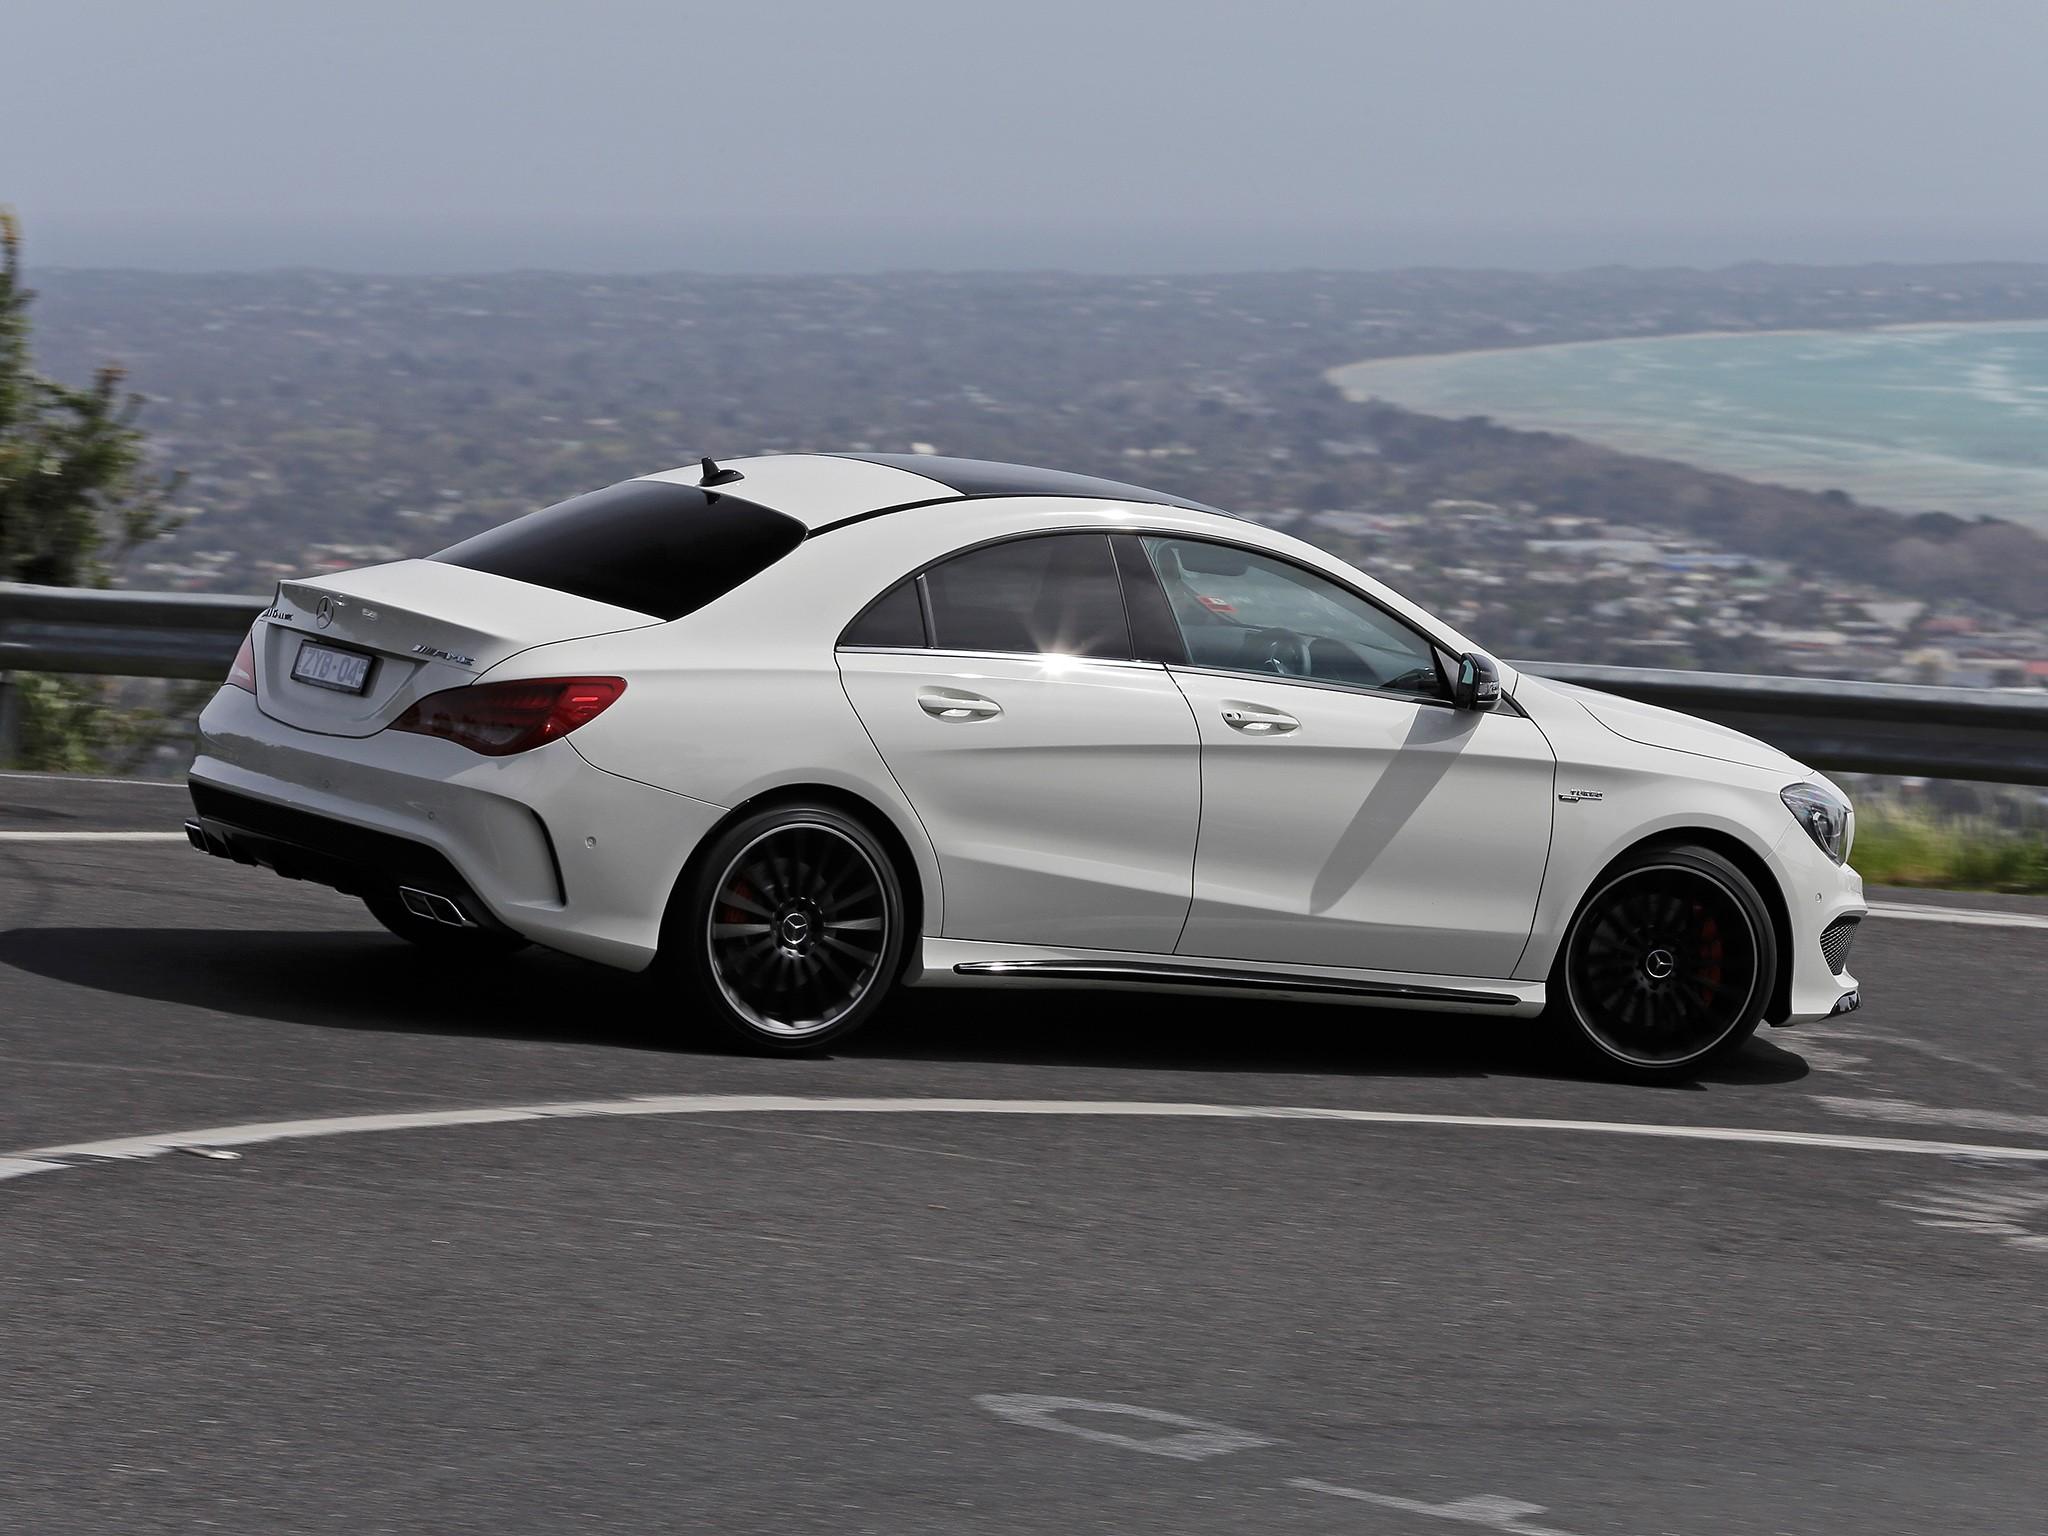 Mercedes benz cla 45 amg 2013 2014 2015 2016 for Mercedes benz cla 2015